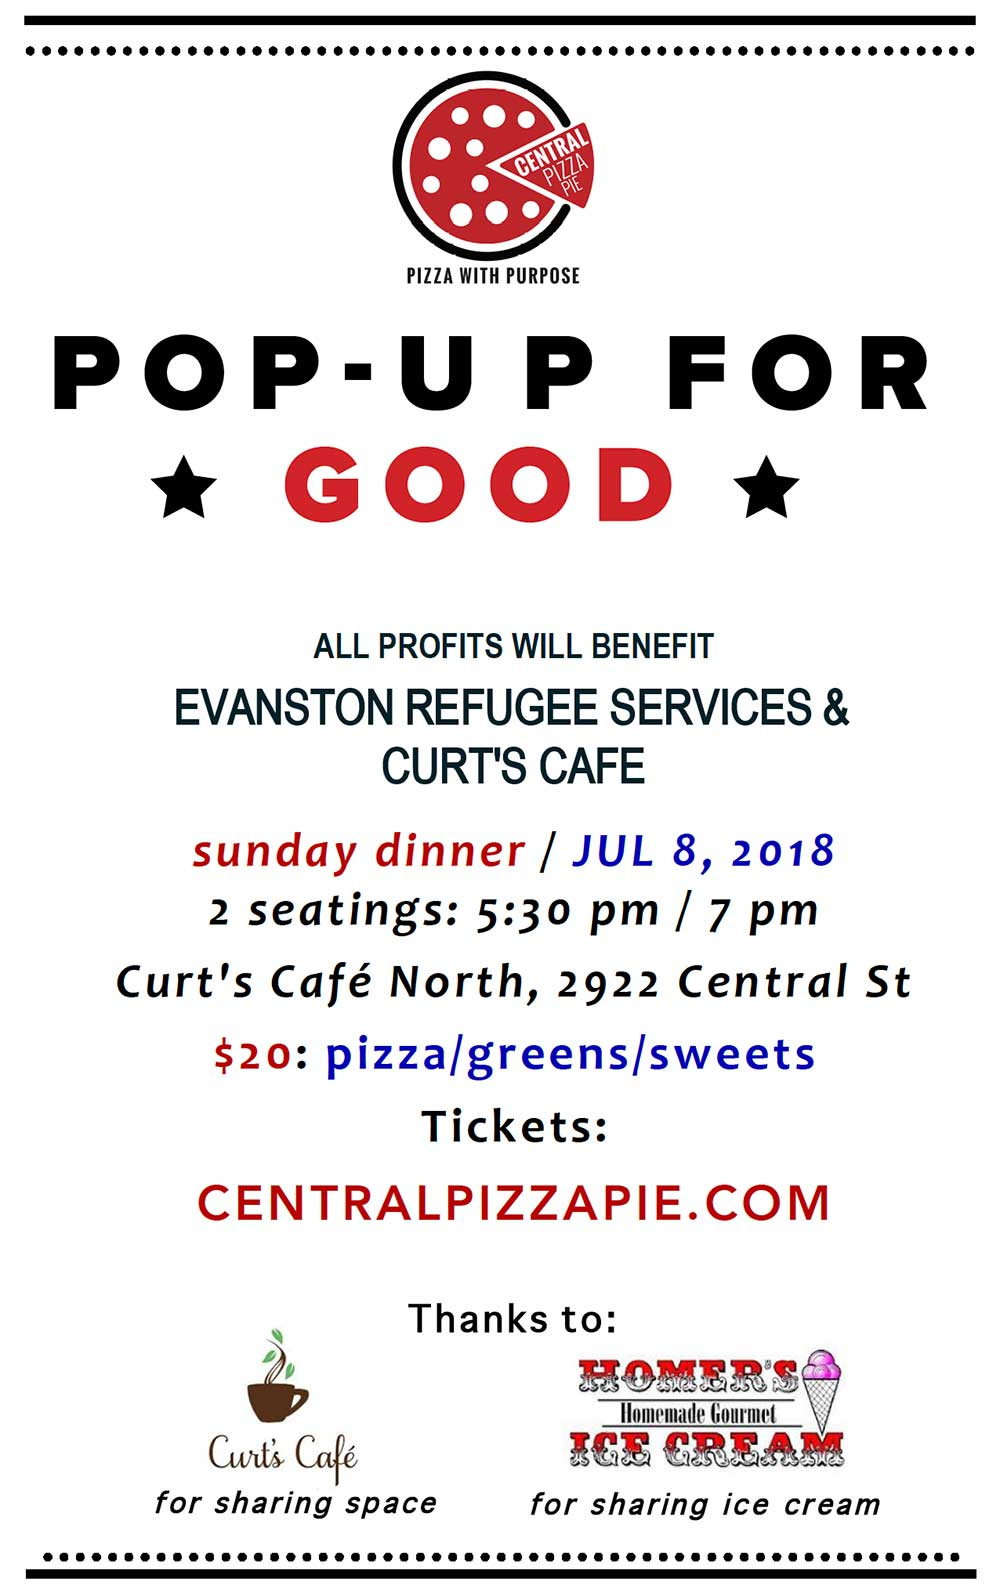 Central Pizza Pie pop-up on July 8 - Curt's Café